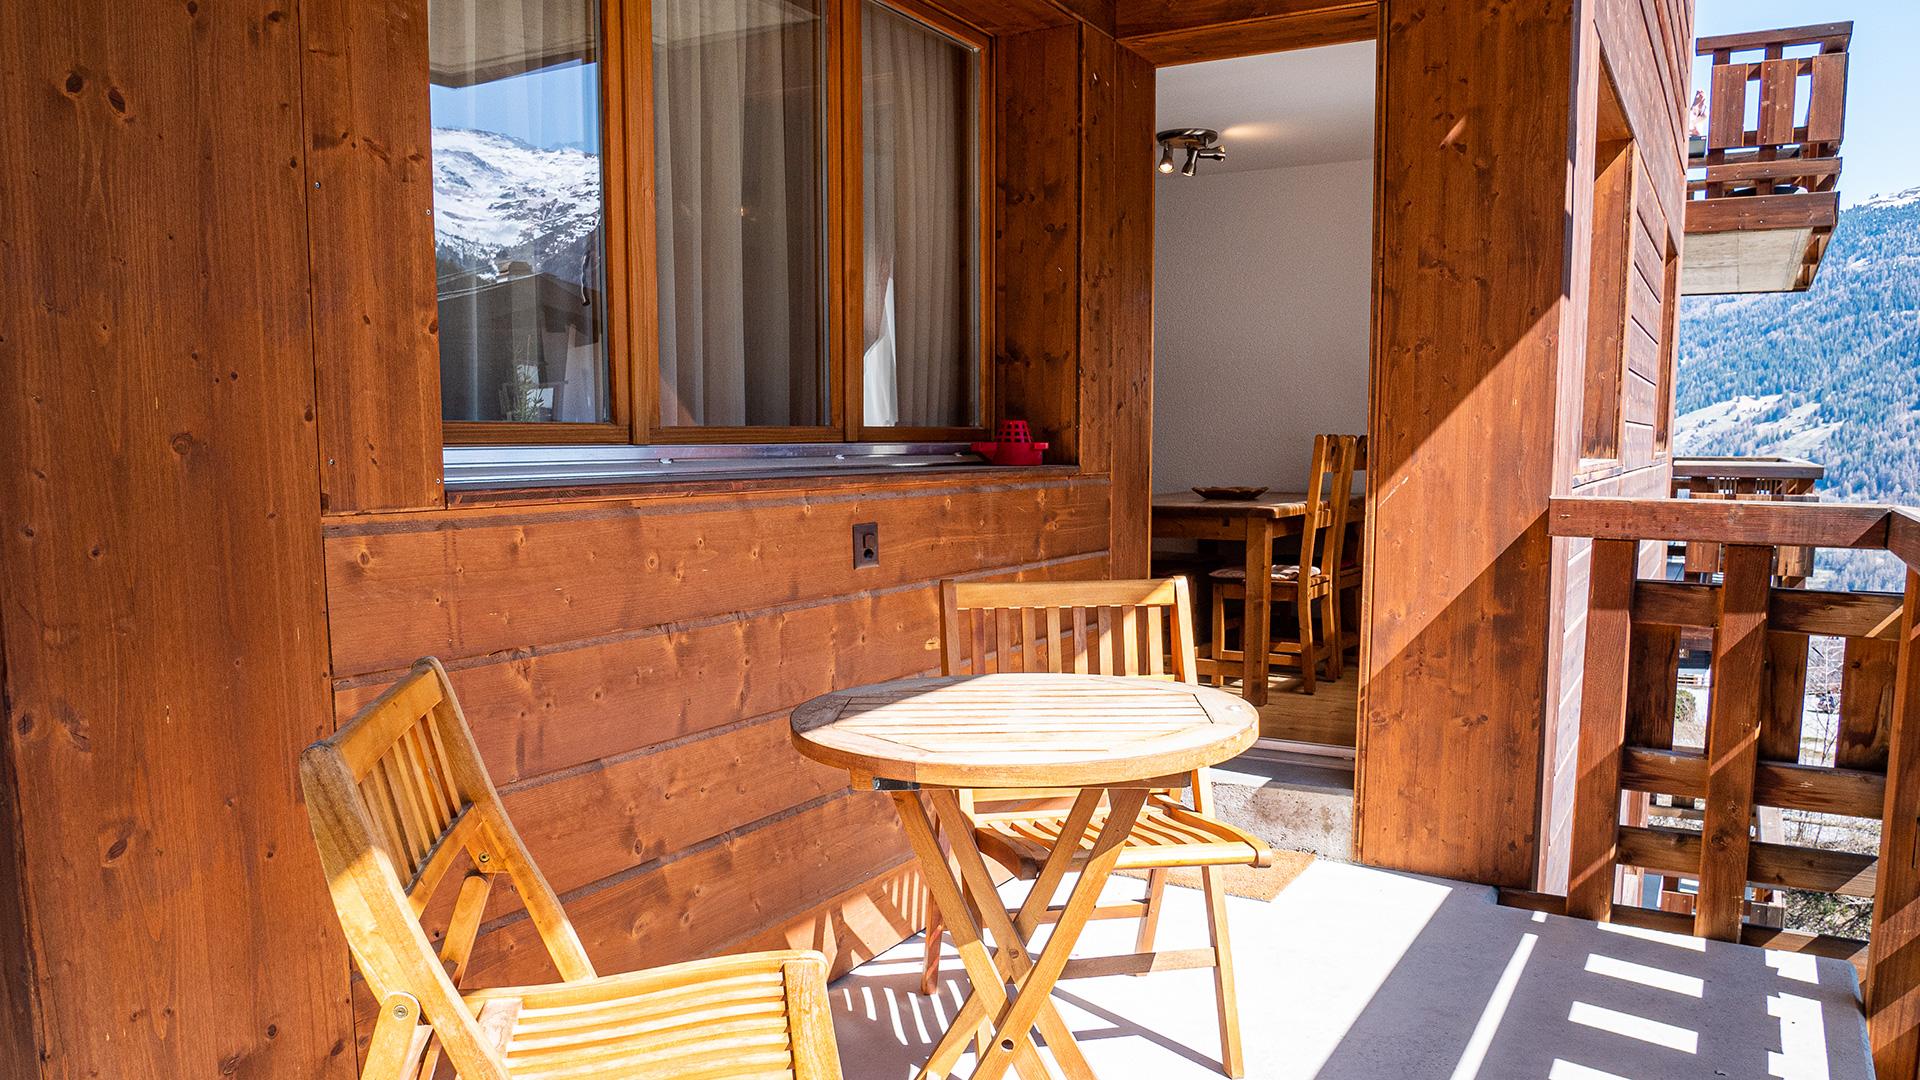 Pied des Pistes 4 Apartments, Switzerland